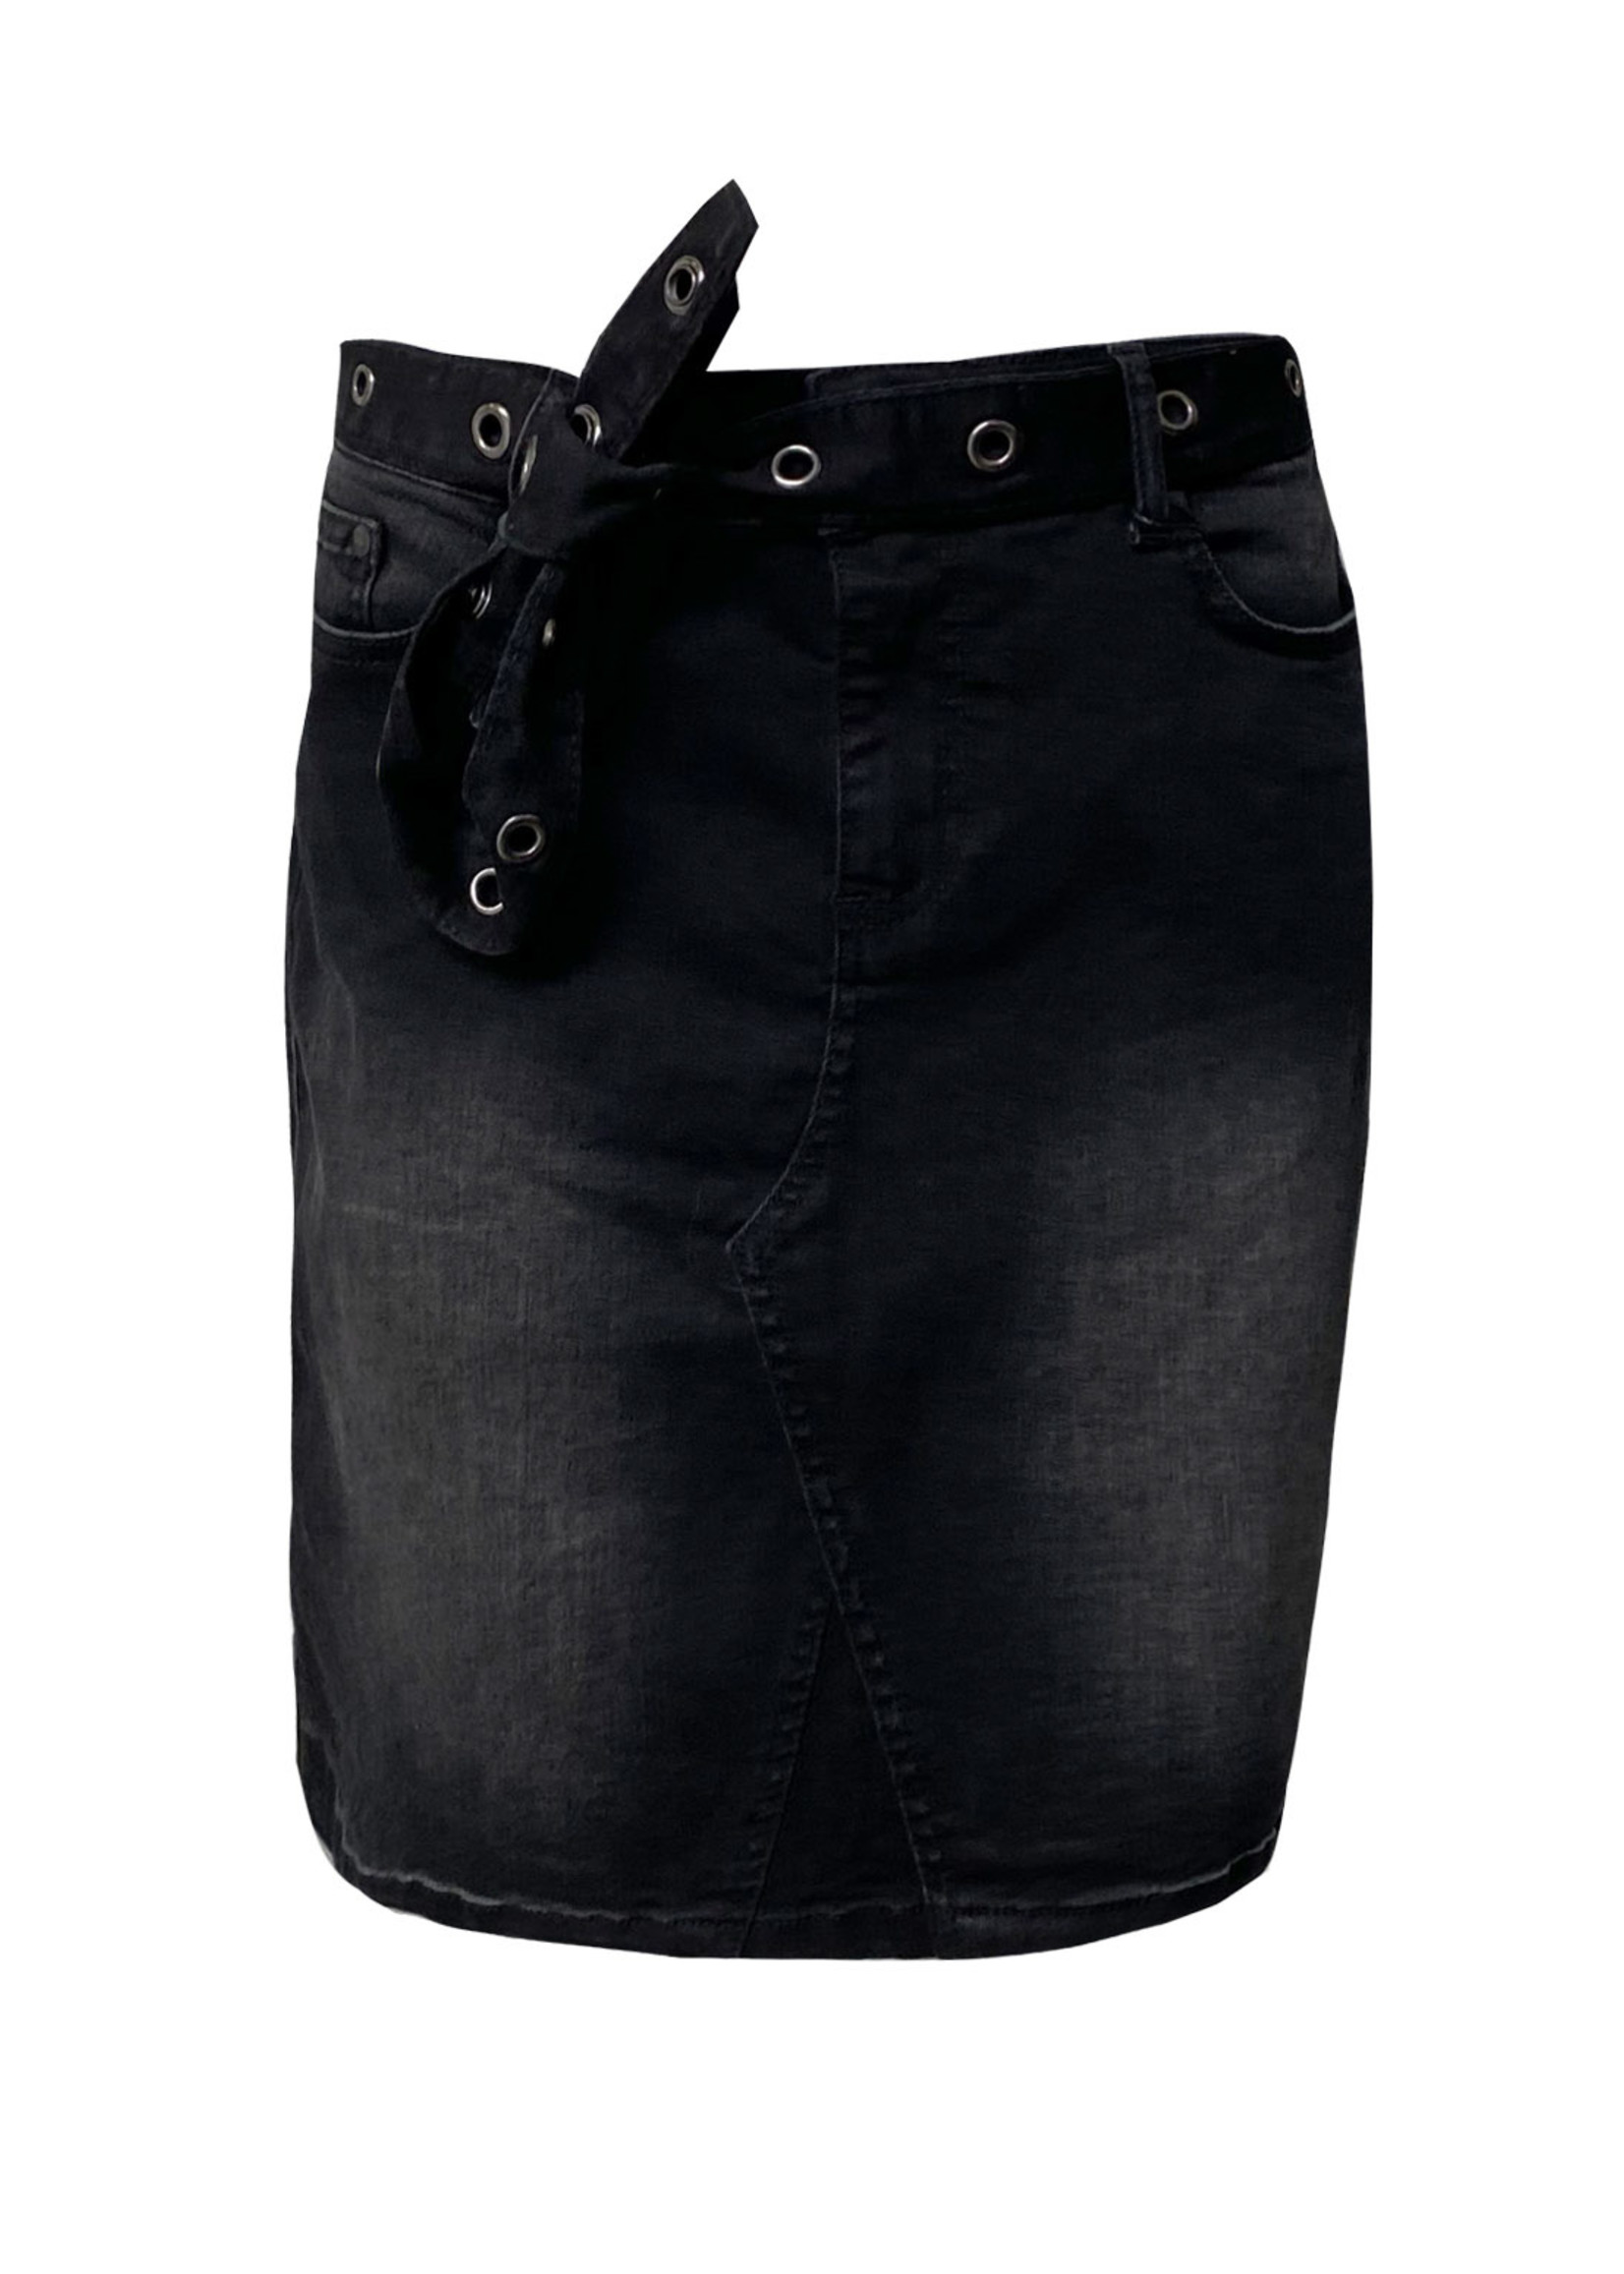 Elvira Collections Elvira Collections Keri Skirt